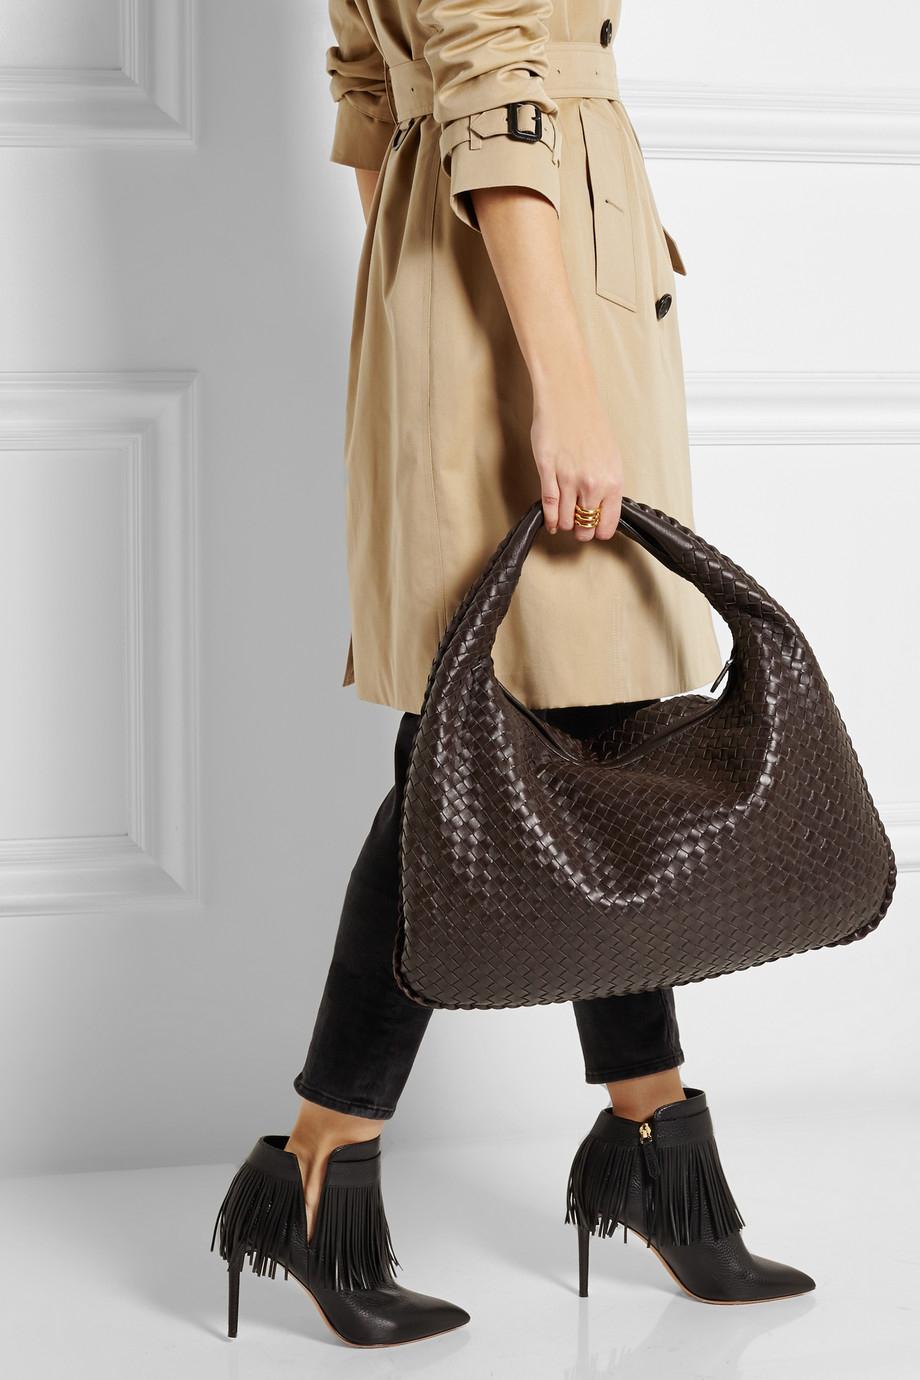 Bottega Veneta Large Veneta Intrecciato Leather Shoulder Bag in ... c9f1093070